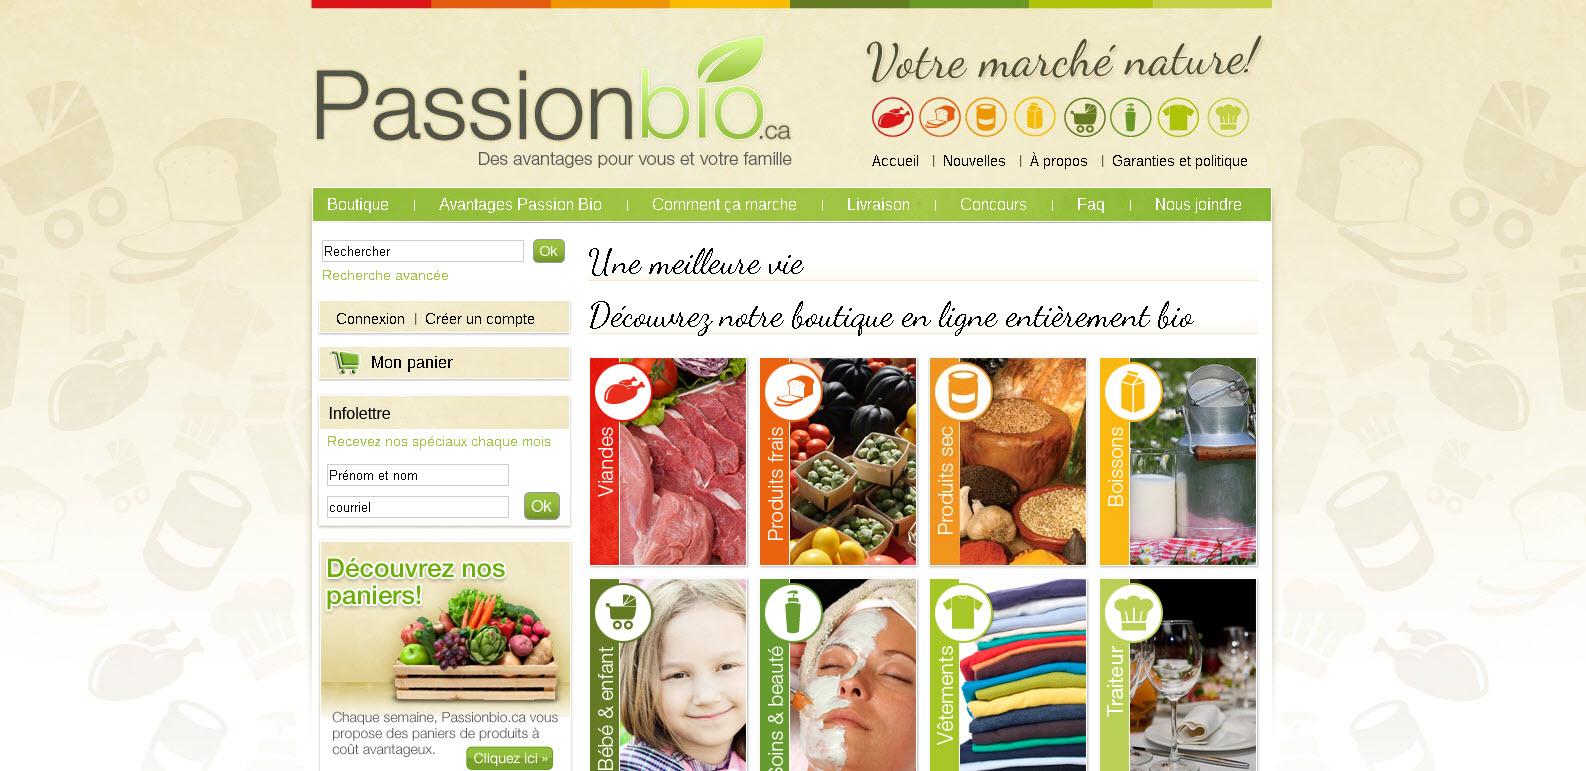 Passion Bio